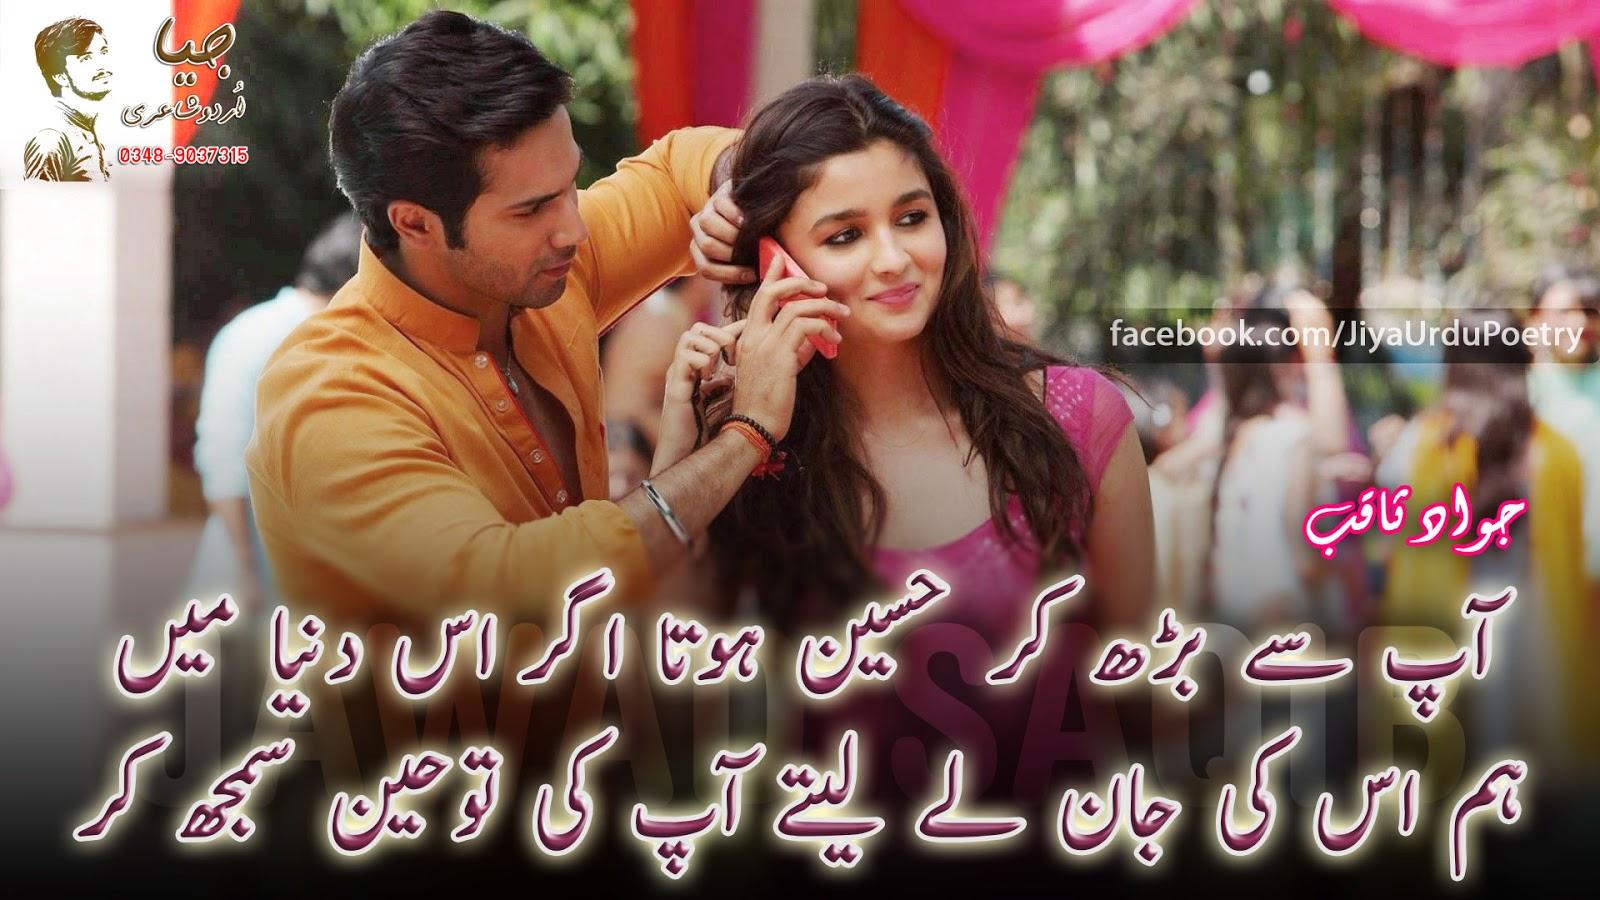 urdu shayari pictures